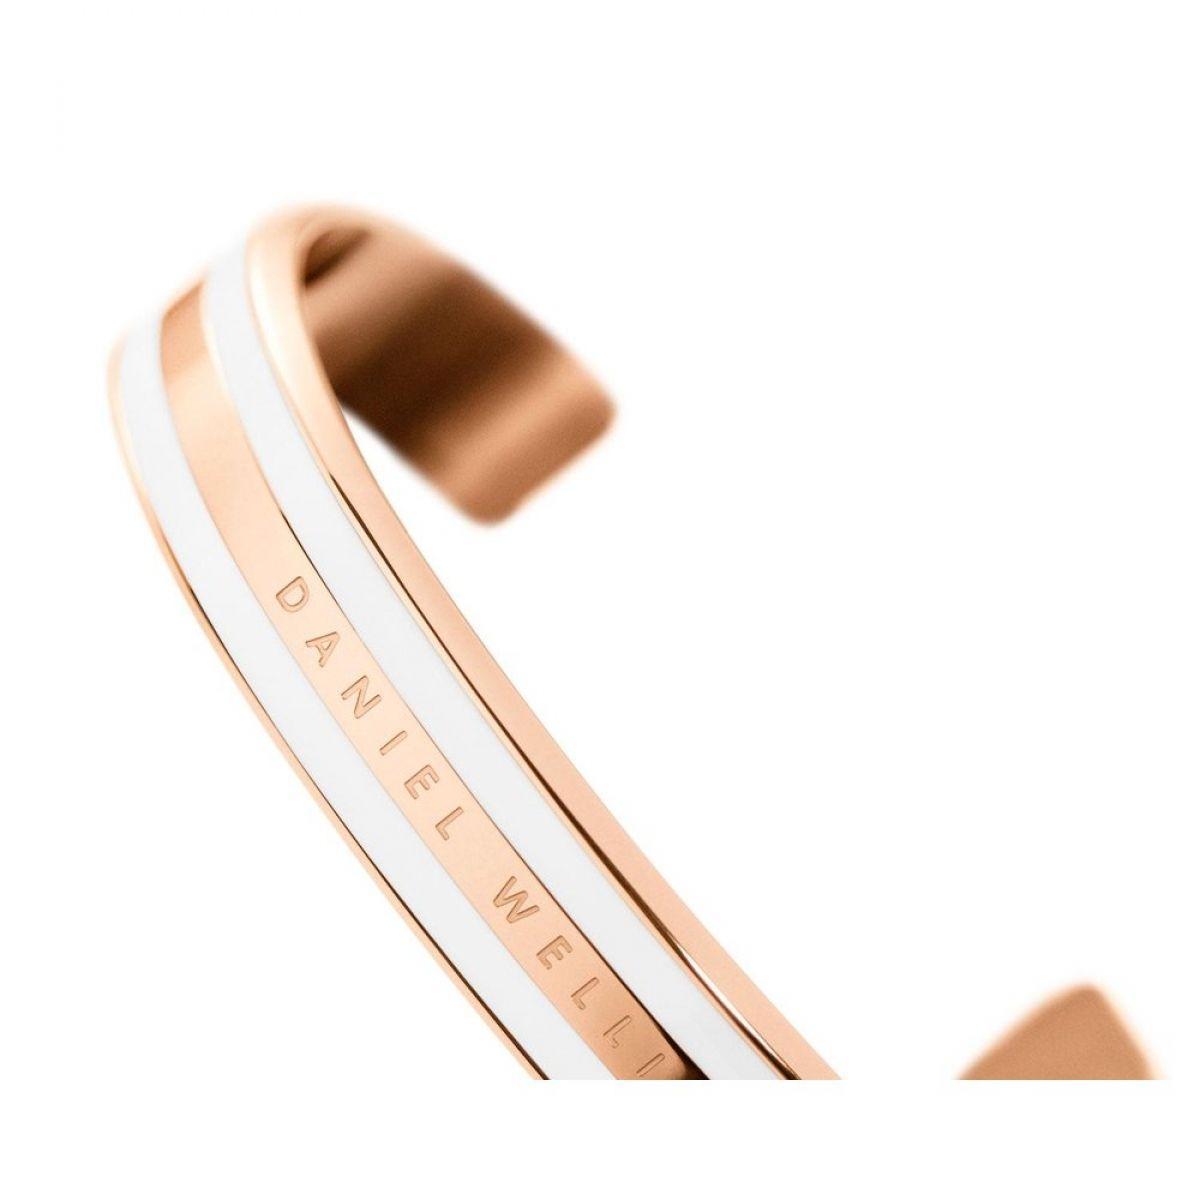 dw官网 dw手表官网 dw中国官网 dw官方旗舰店 DW DW官网  Classic Bracelet Satin White RG S